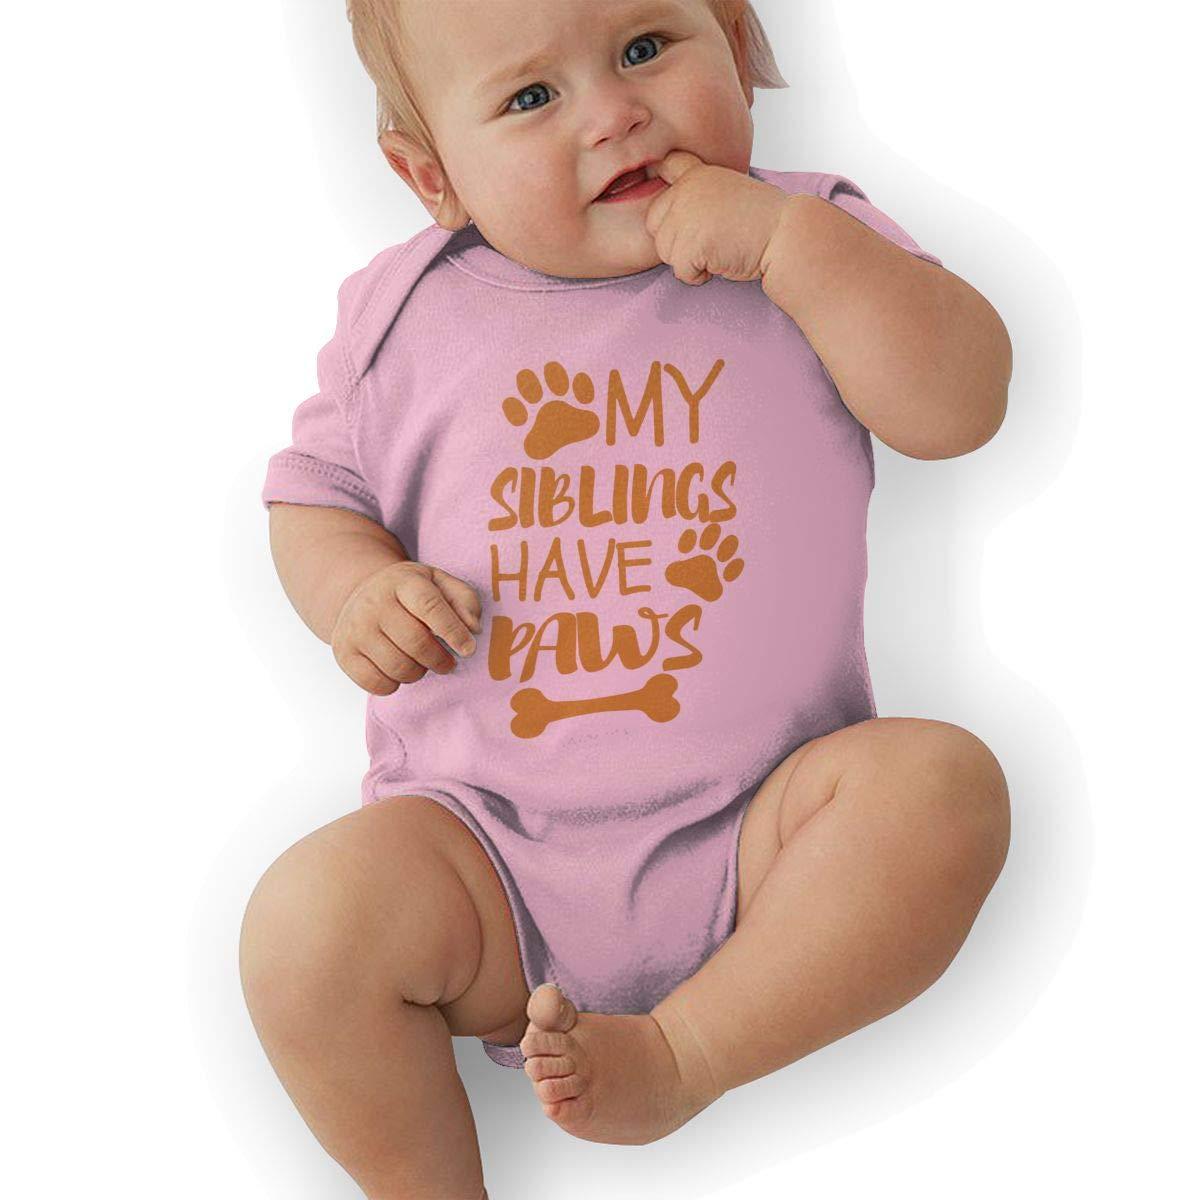 My Siblings Have Paws Hip Hop Newborn Baby Short Sleeve Bodysuit Romper Infant Summer Clothing Black